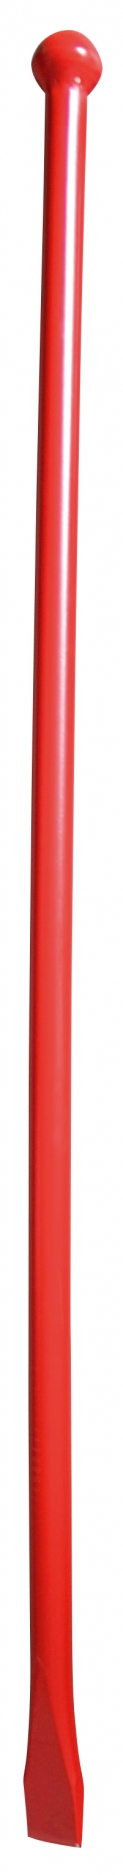 Breekstang rond Ø 28 mm - Bol/beitel - 1200 mm